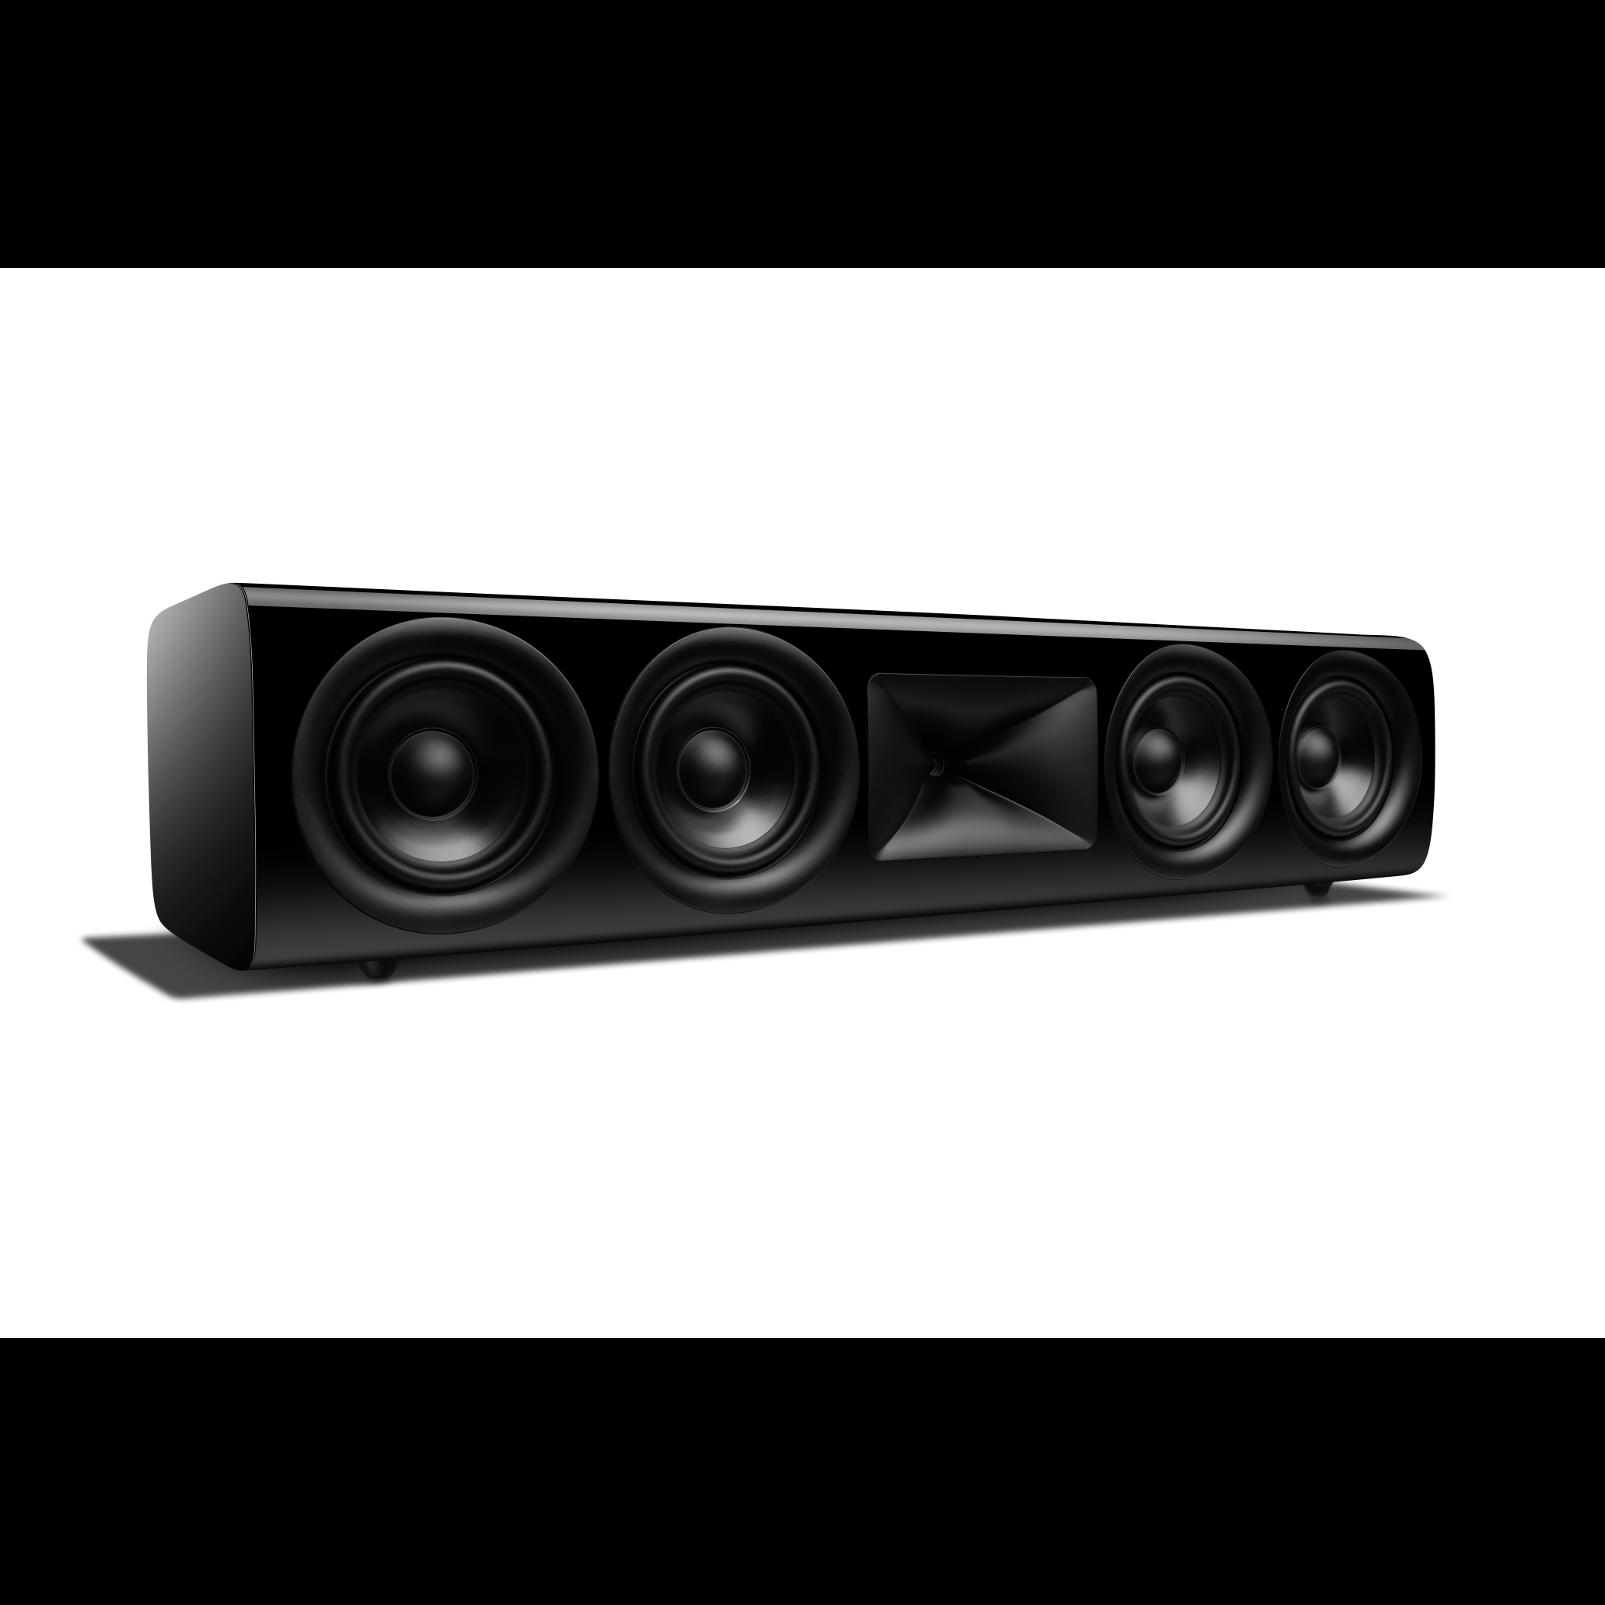 HDI-4500 - Black Gloss - 2 ½-way Quadruple 5.25-inch (130mm) Center Channel Loudspeaker - Left